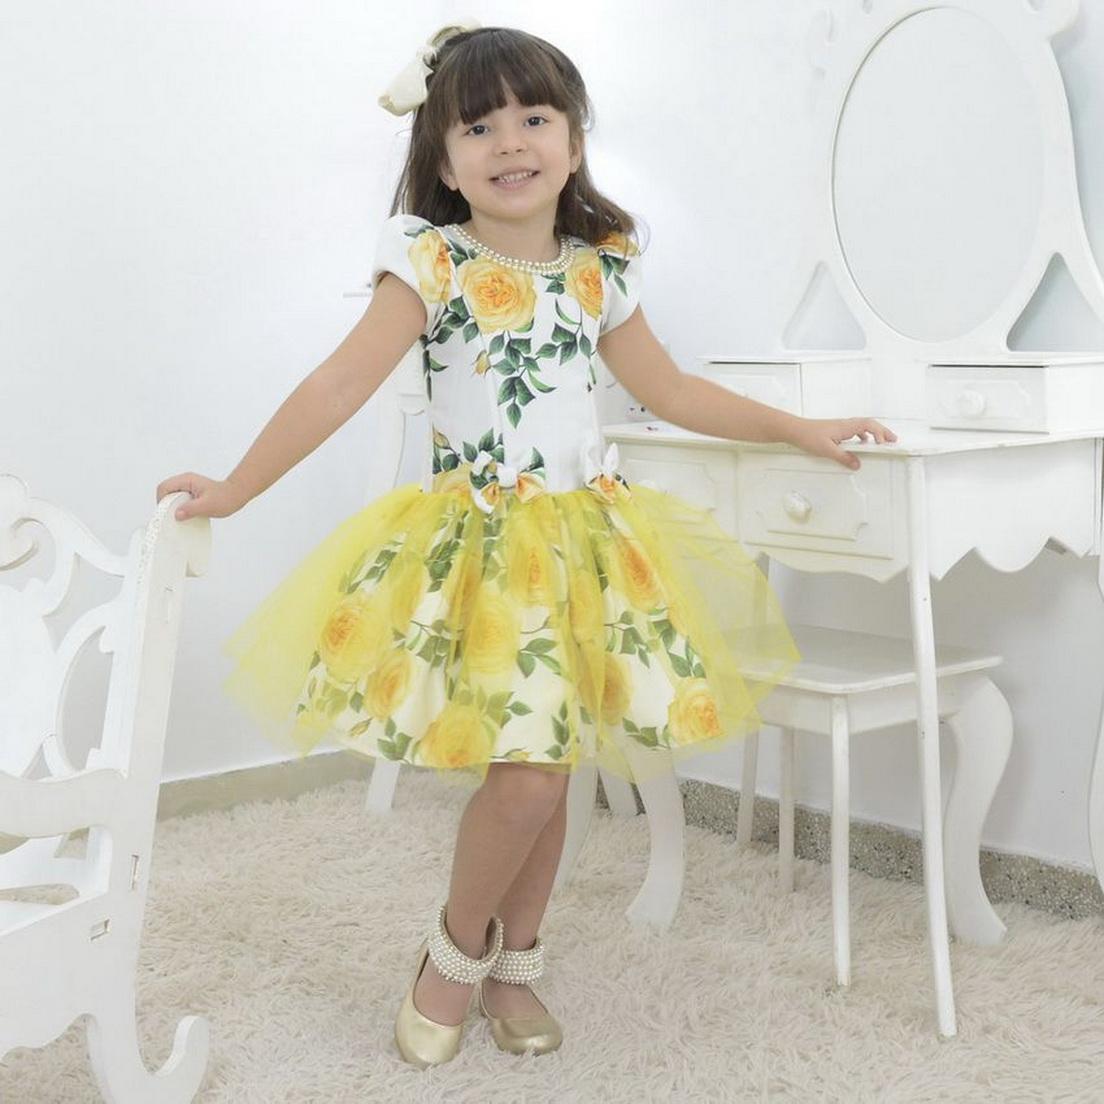 Vestido Floral infantil amarelo com tule sobre a saia